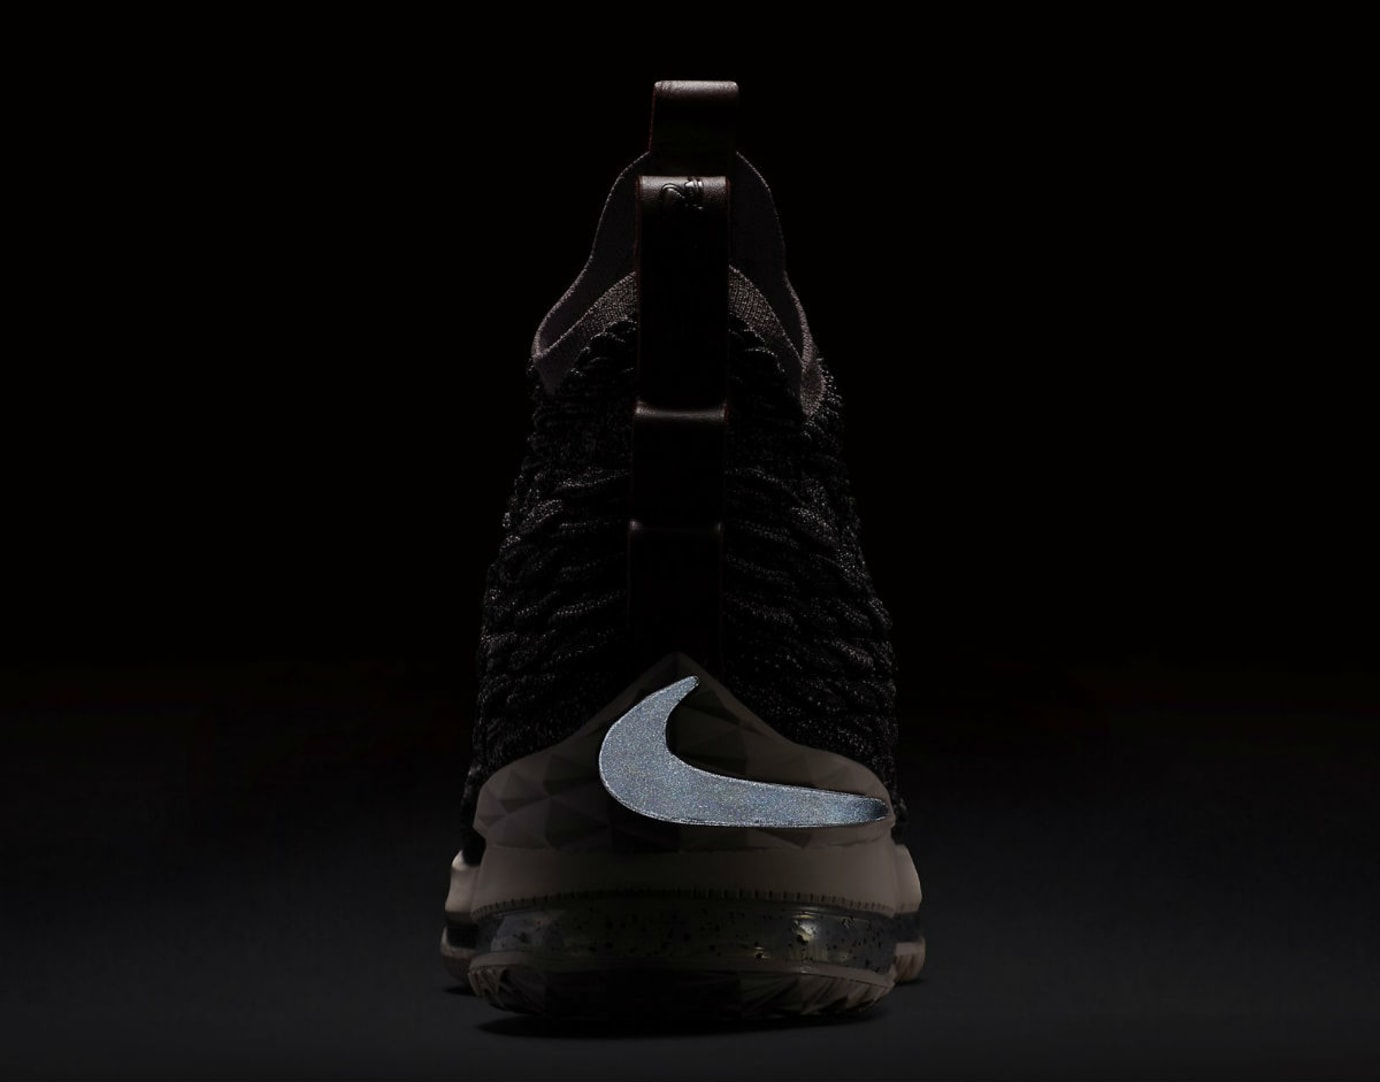 Nike LeBron 15 Pride of Ohio Release date 897648-003 3M